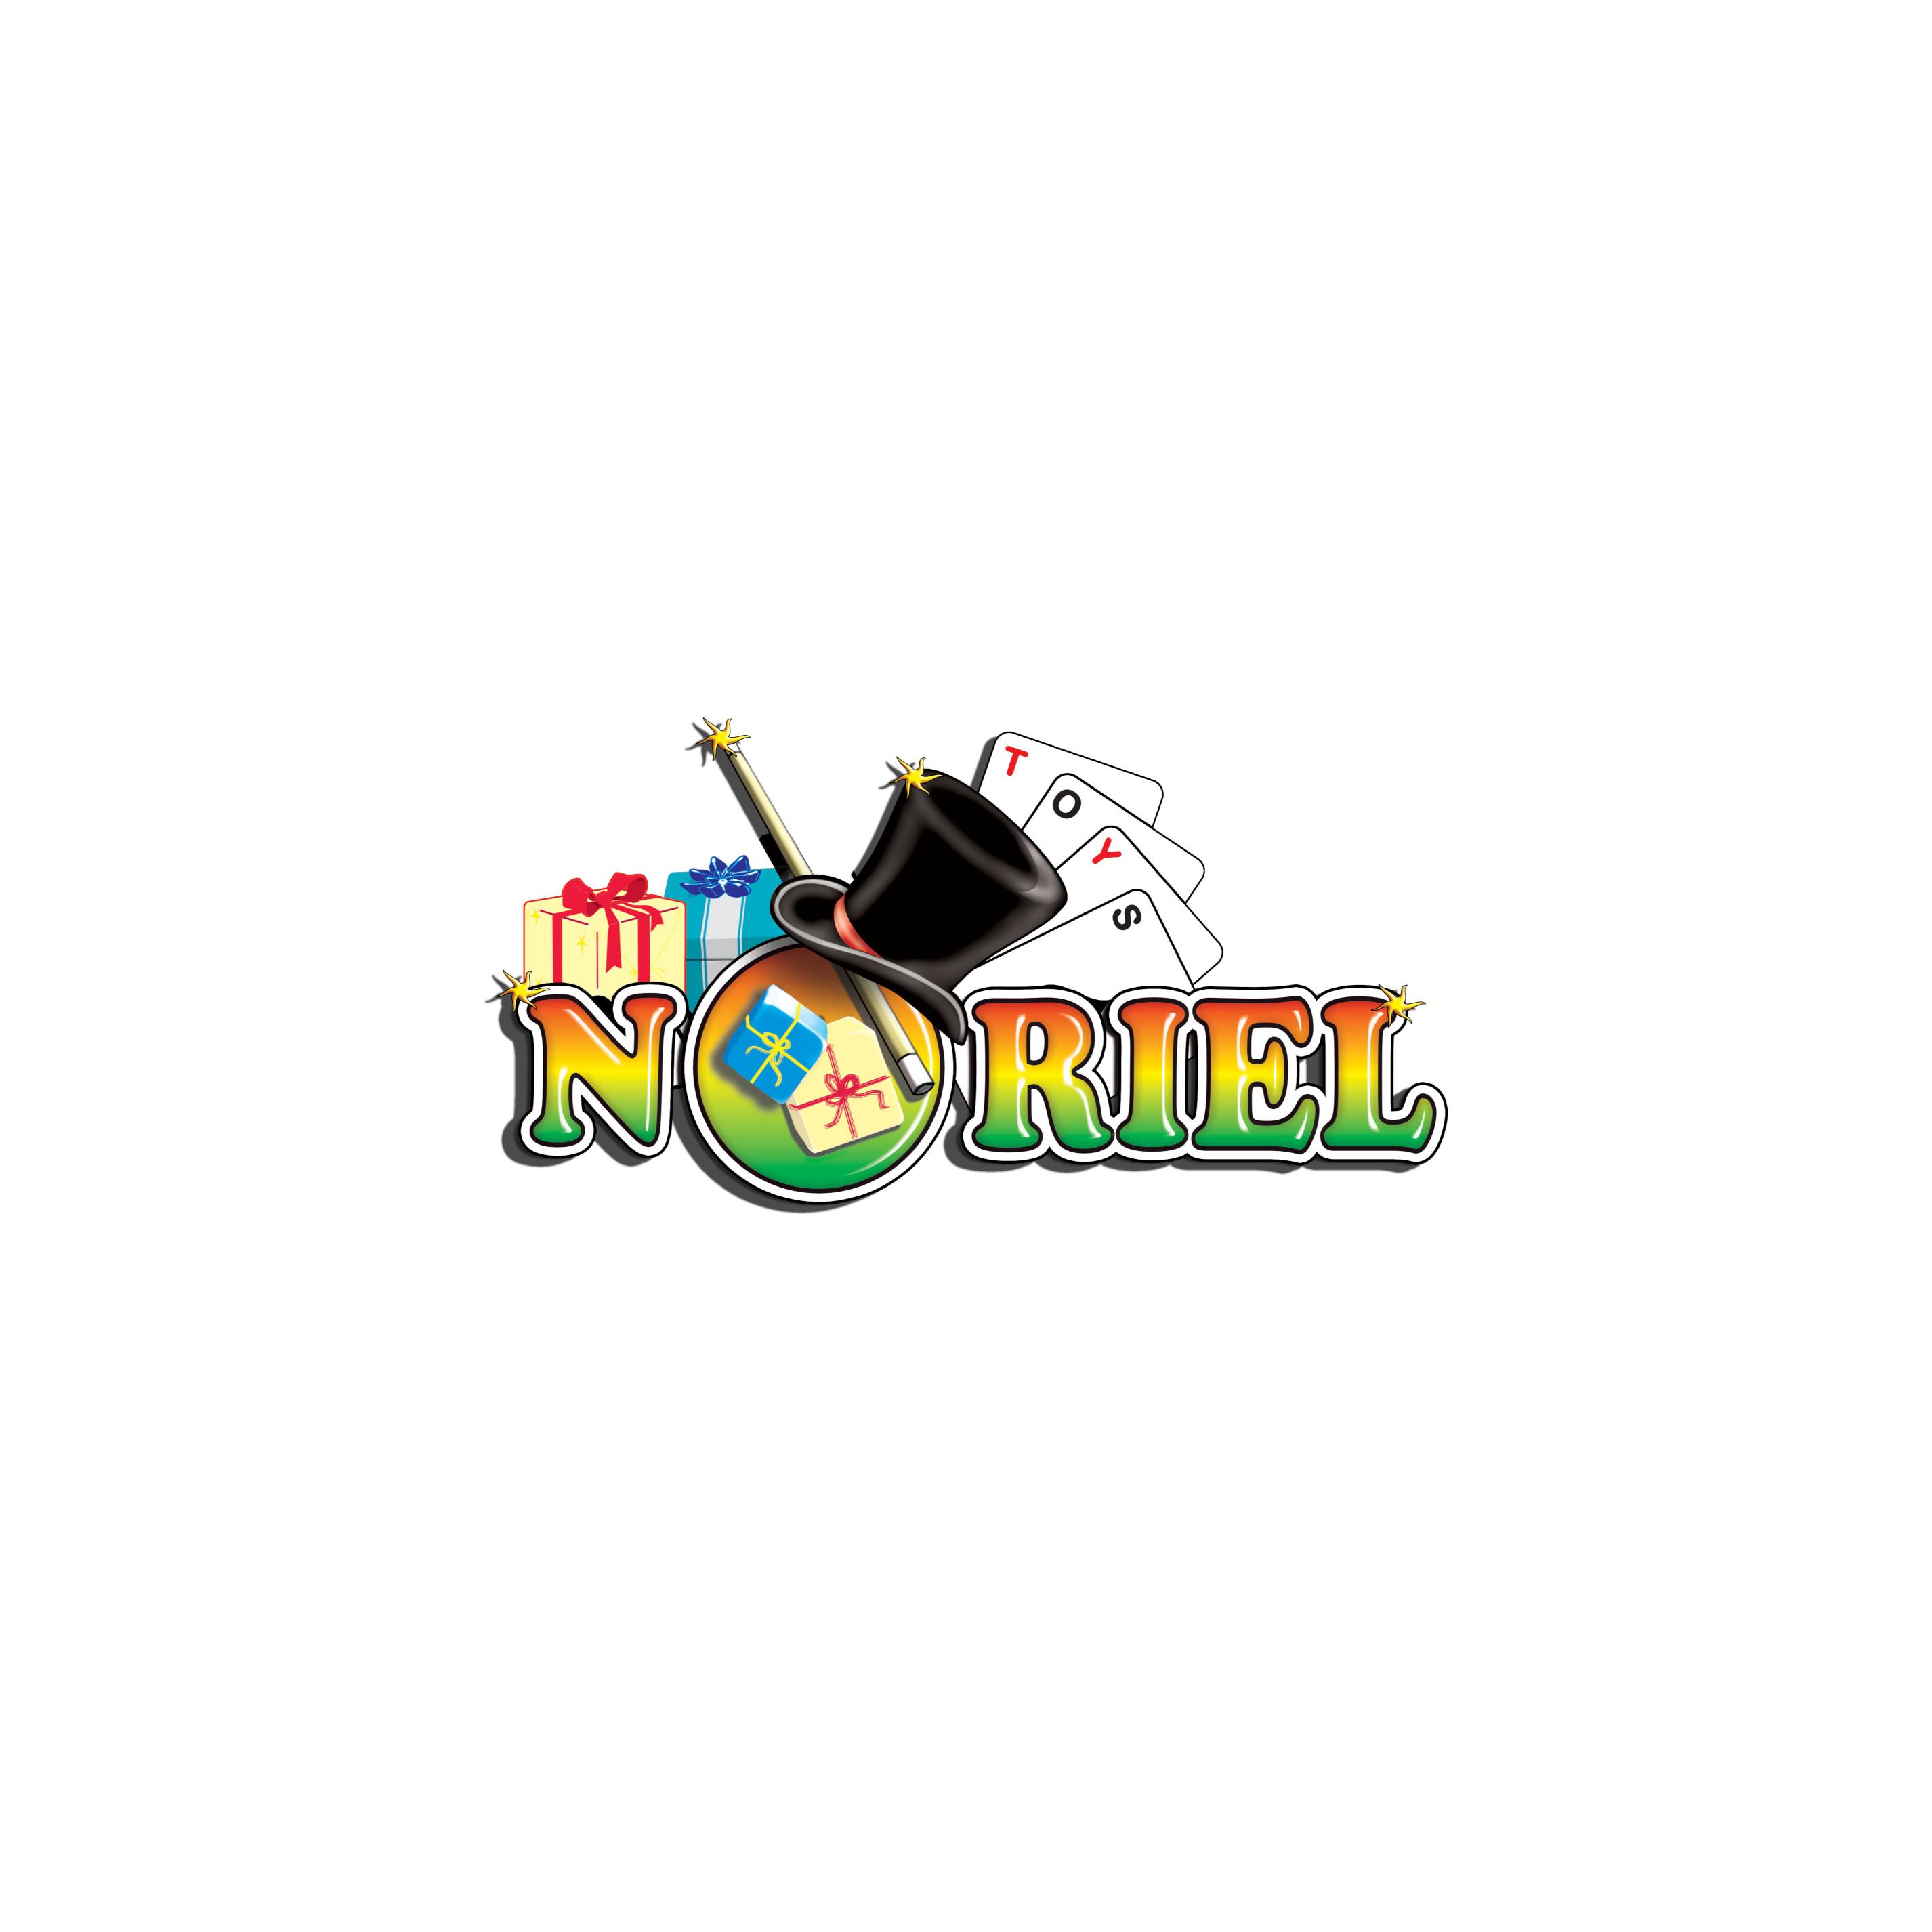 DK000562573_001w Set stickere Disney Minnie Mouse, 10 x 22 cm